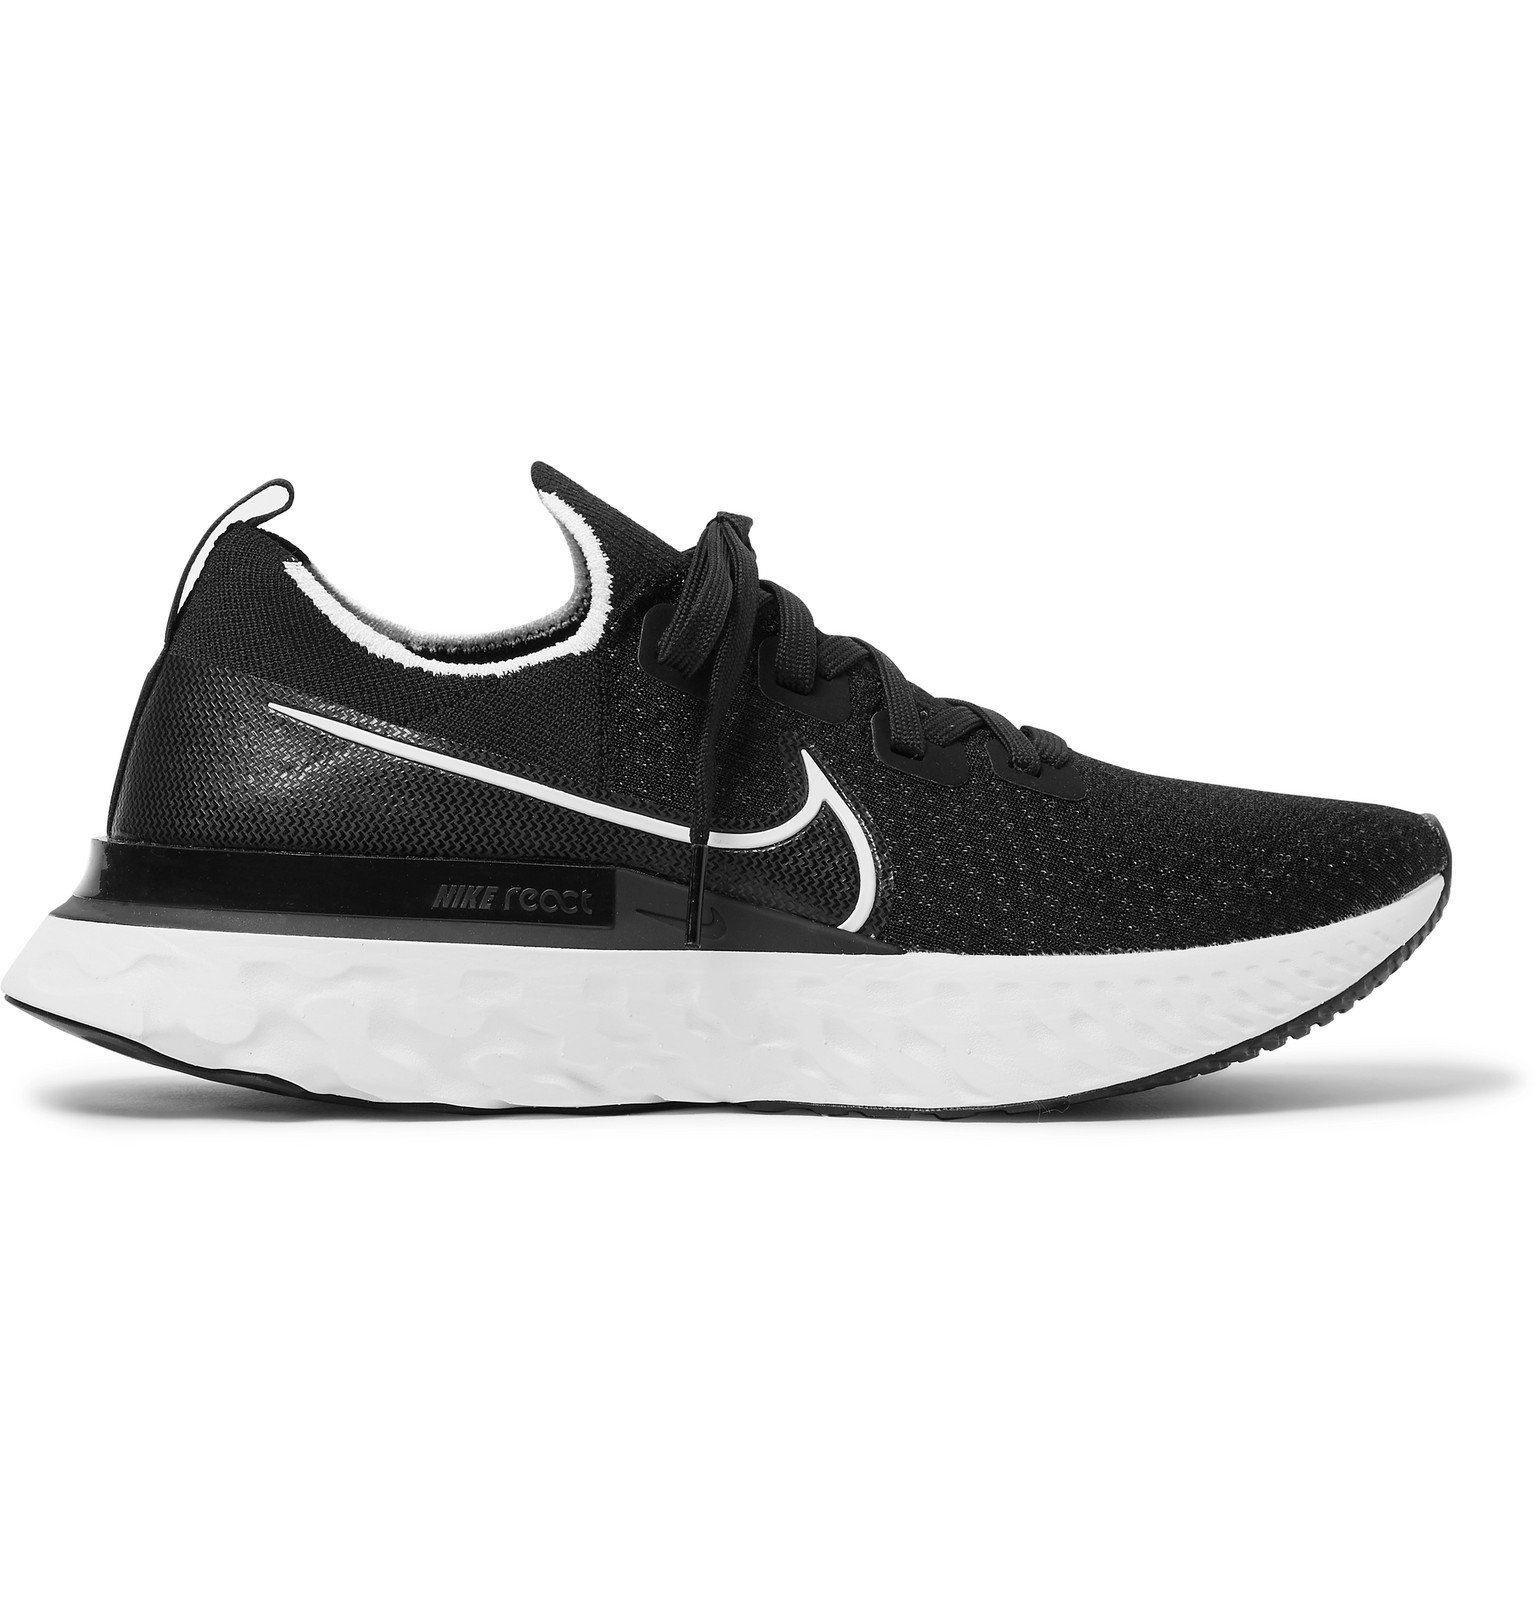 Nike Running - React Infinity Run Flyknit Running Sneakers - Black